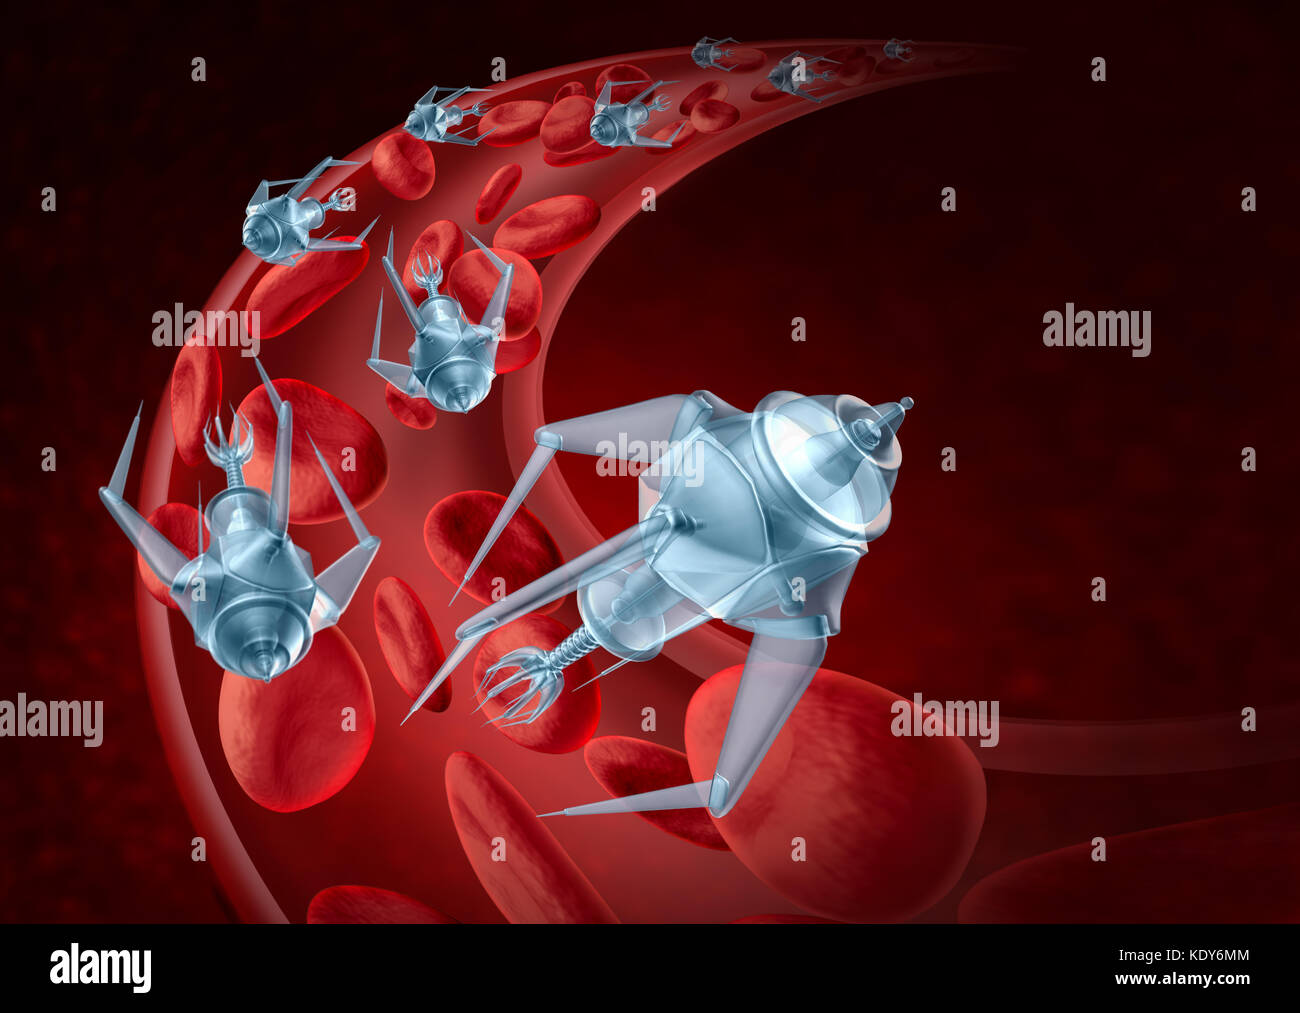 Nanorobots and nanotechnology bioengineering and advanced medical technology concept as nanomedicine robots inside - Stock Image